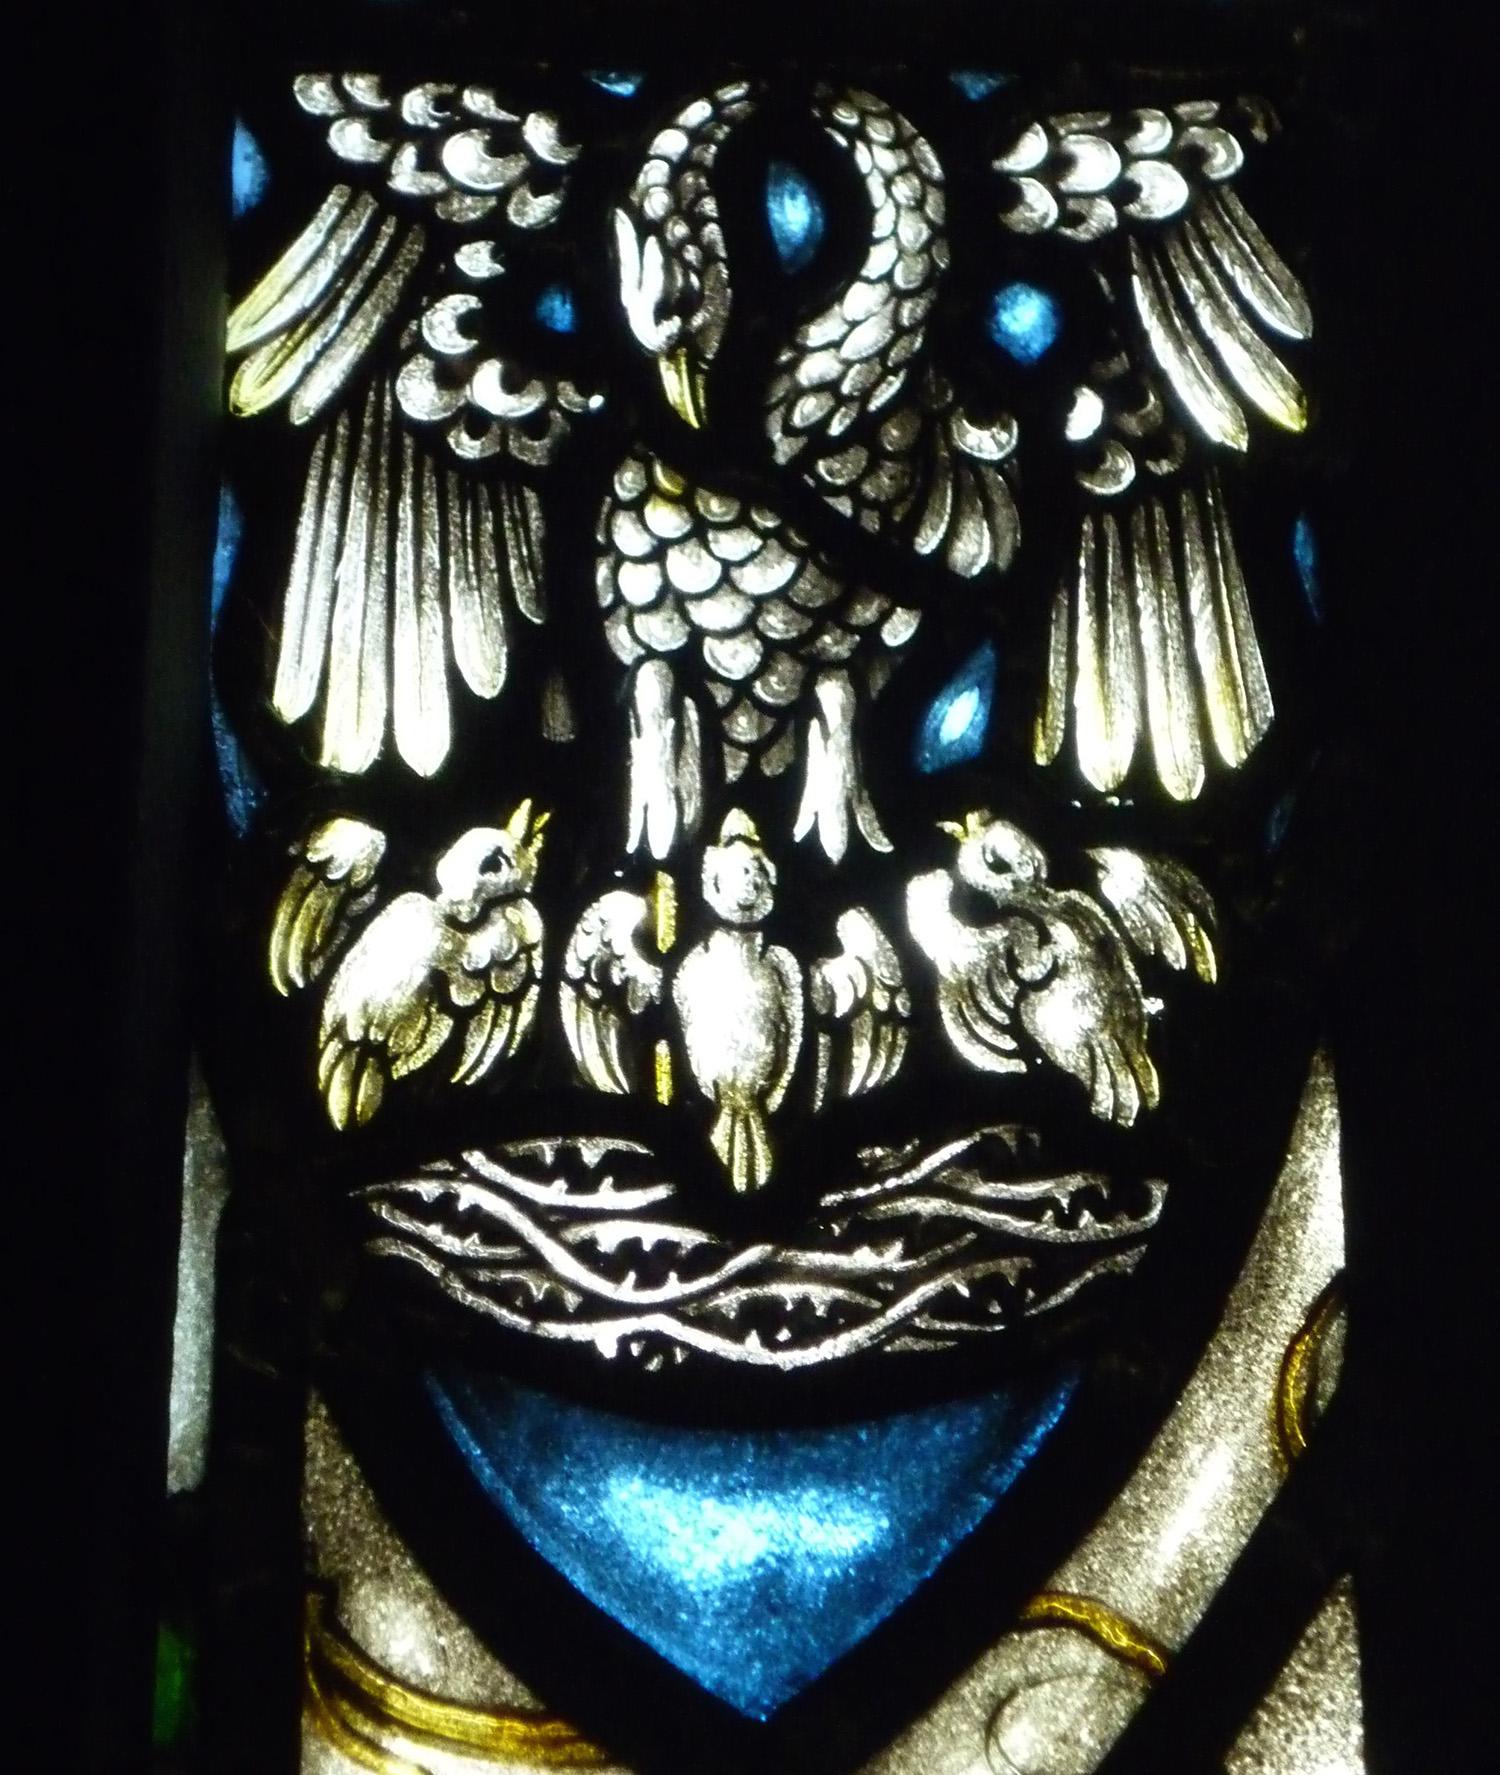 Bonawit Window, border detail